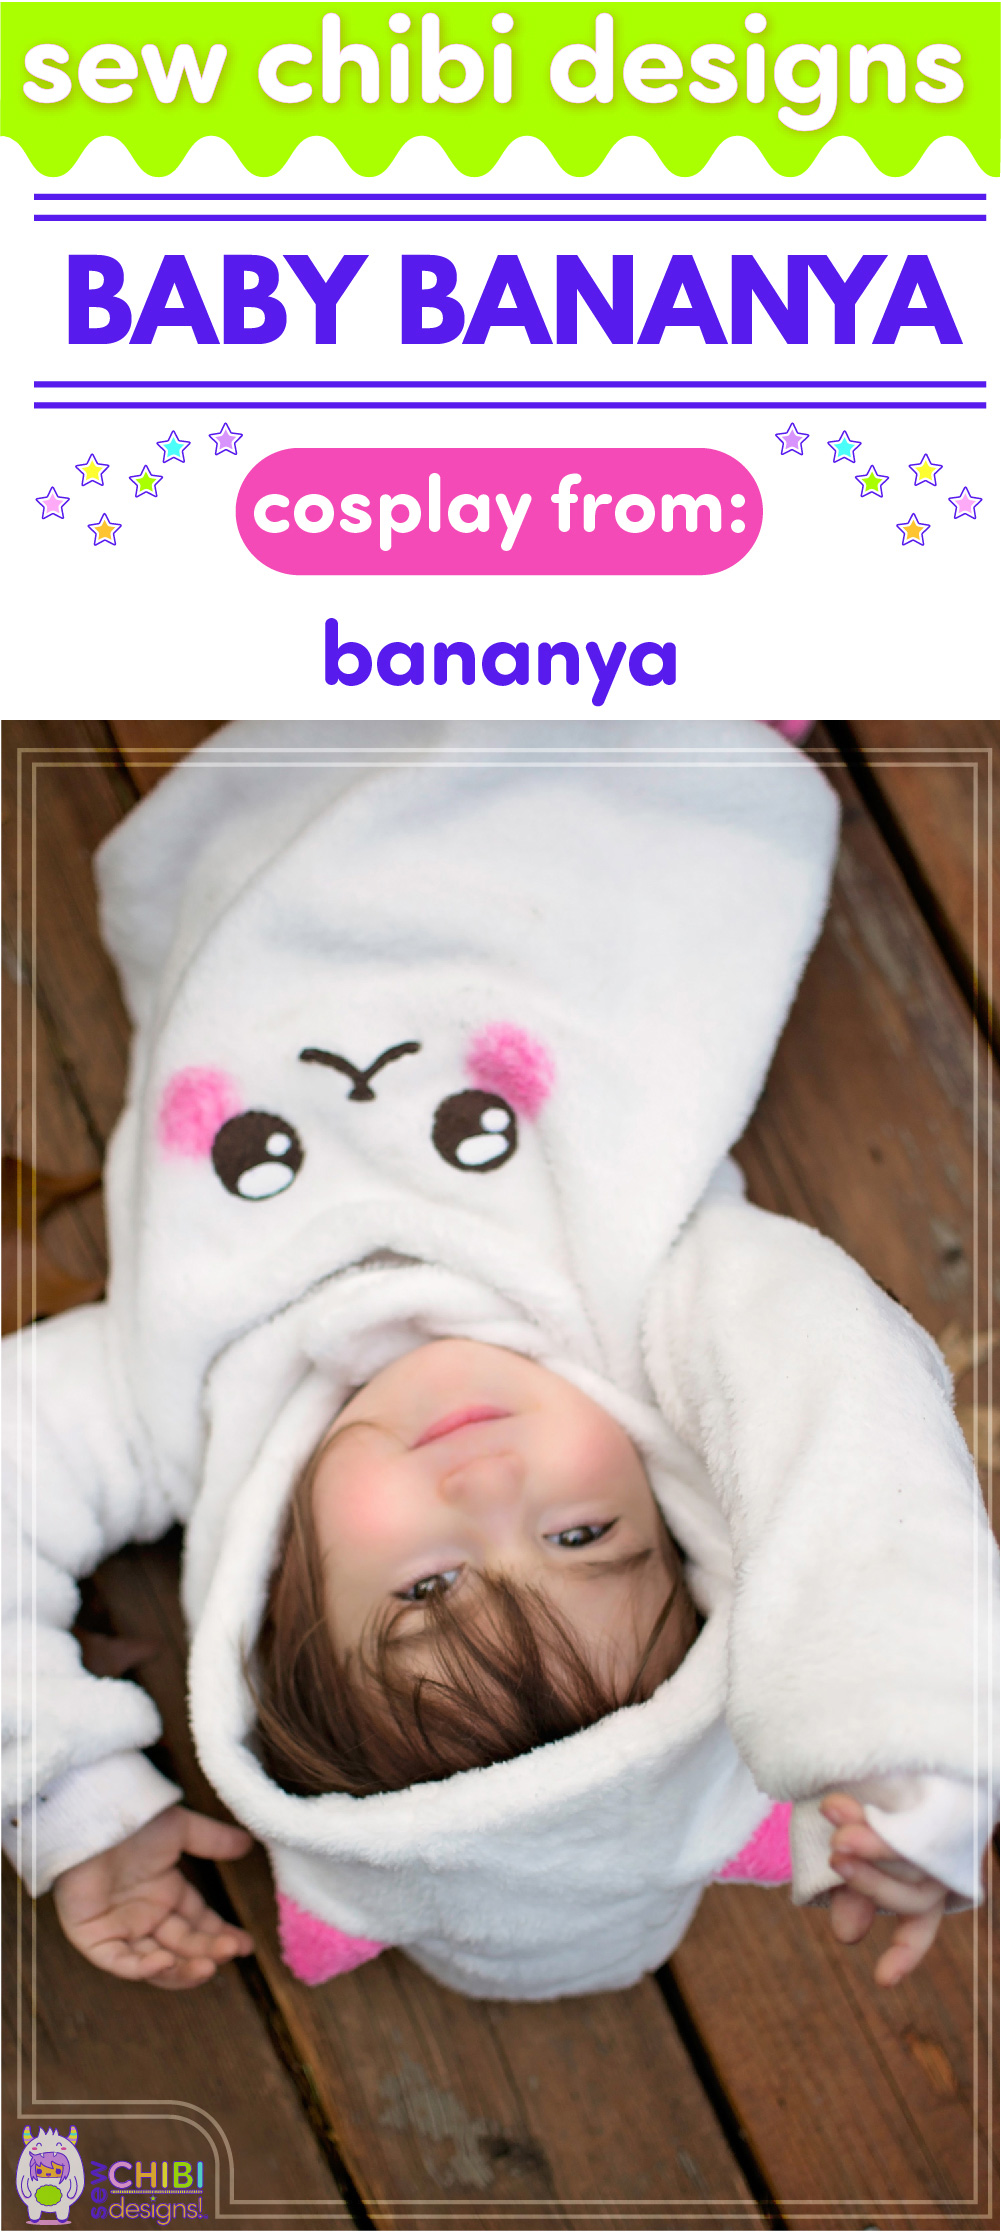 Baby Bananya chibi cosplay from Crunchyroll's Bananya ( ばなにゃ ) sewn by Sew Chibi Designs for Sew Geeky